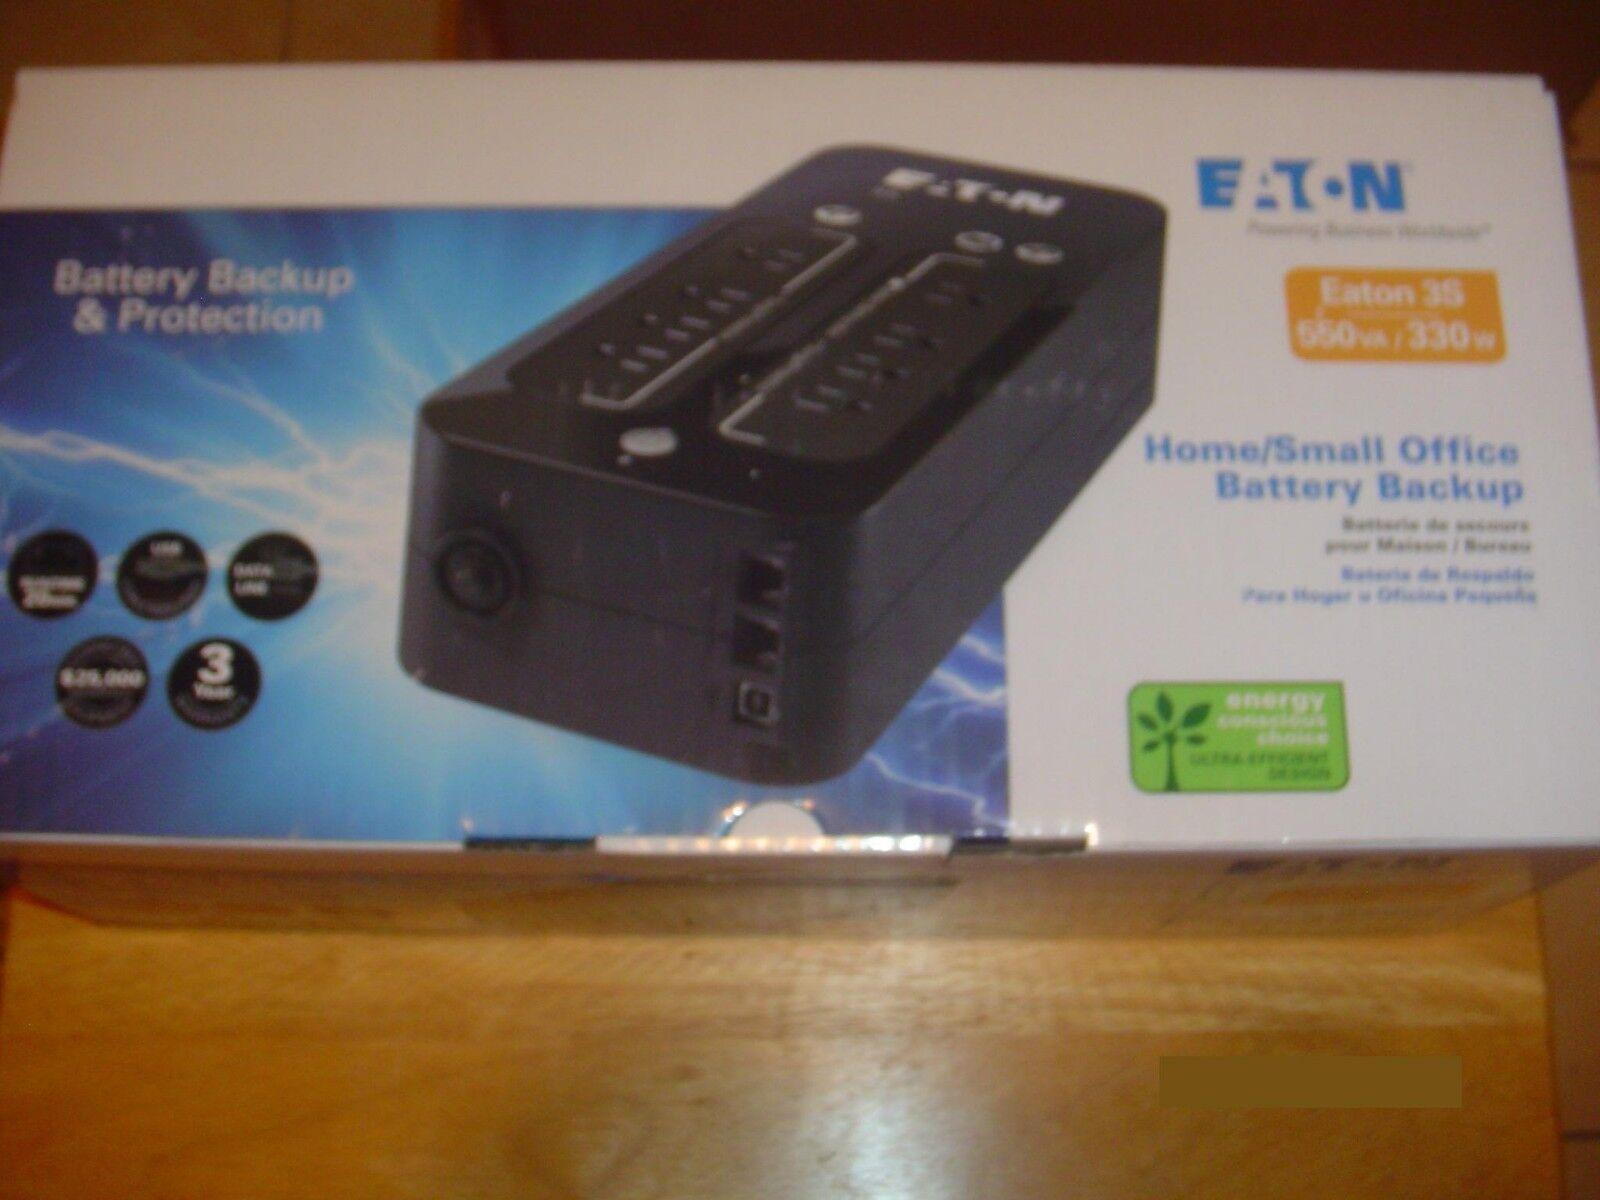 Eaton 3S550 UPS Home Small Office Battery Backup - NEW - PRI